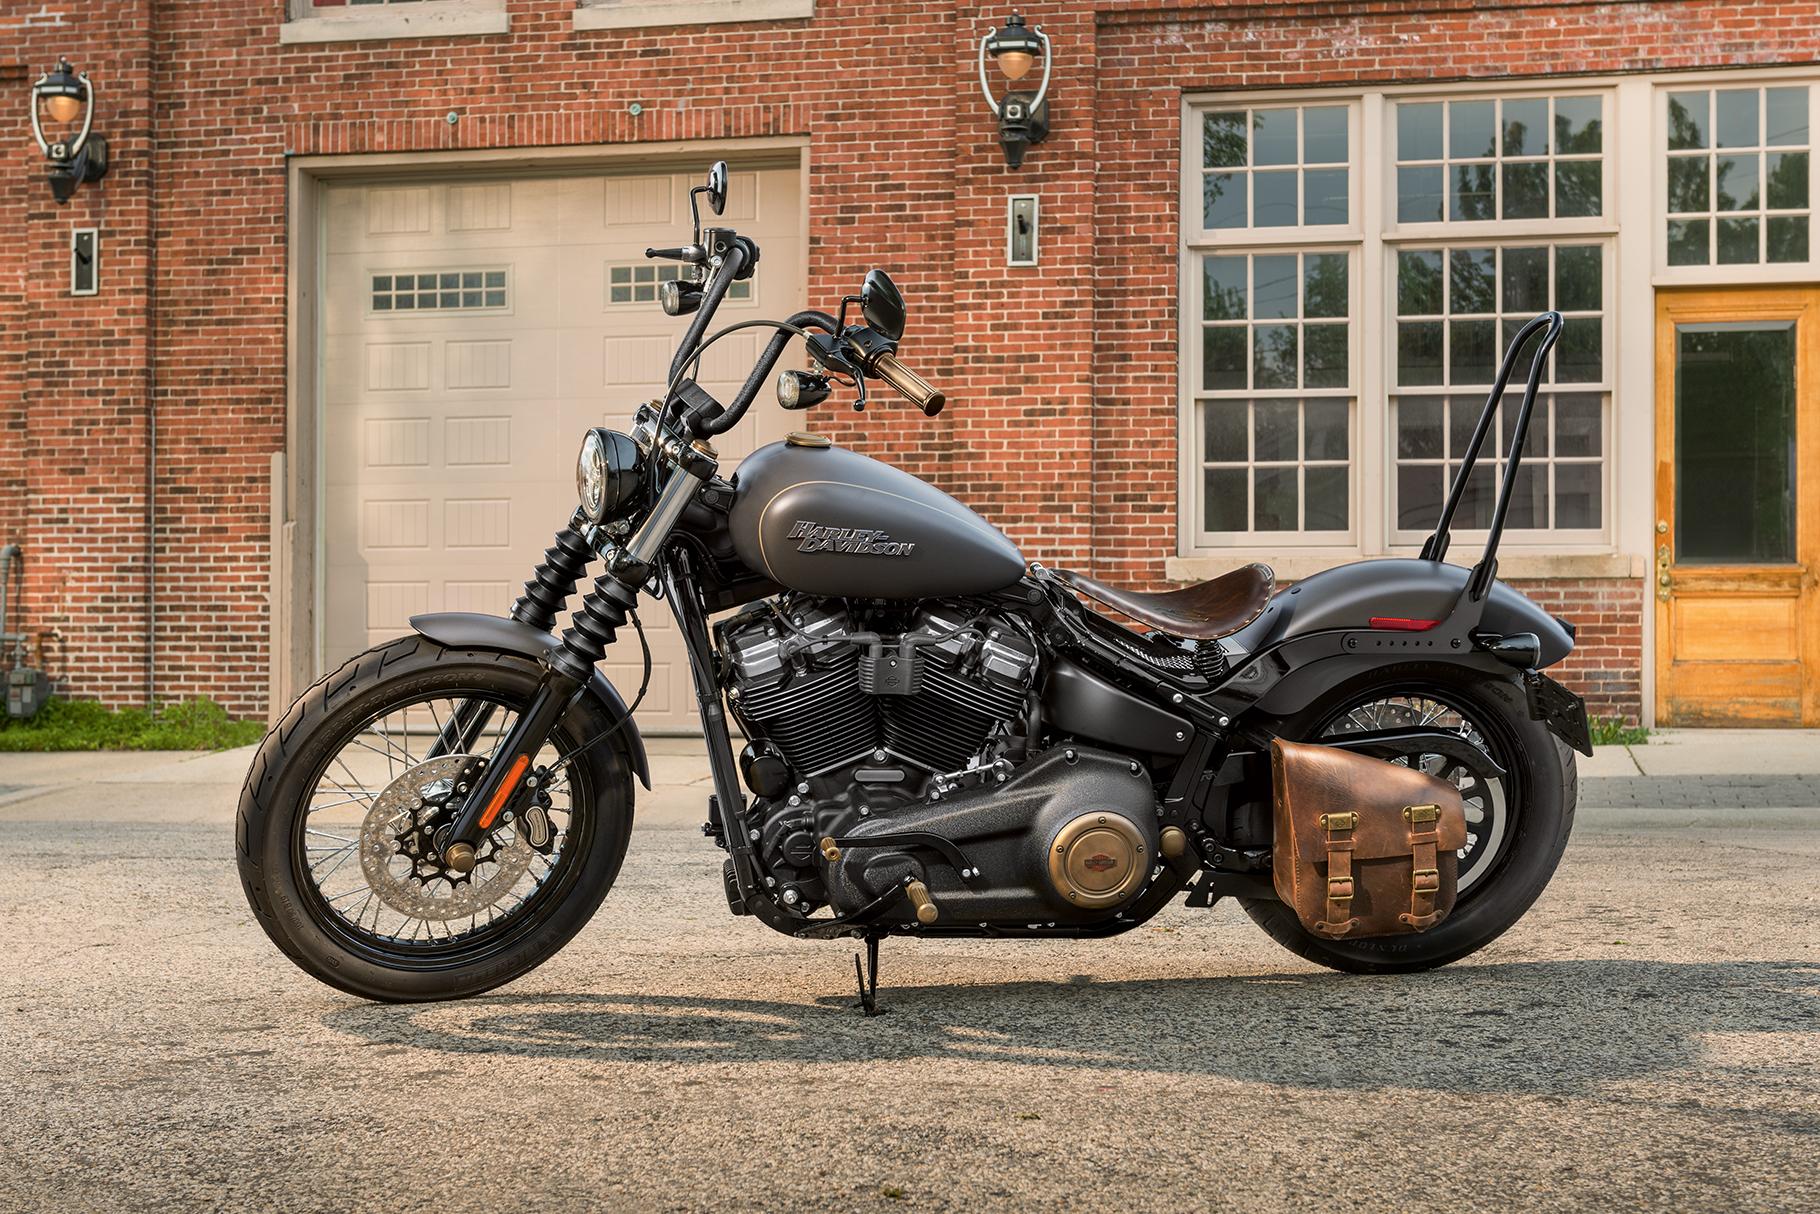 2019 Street Bob Motorcycle | Harley-Davidson USA